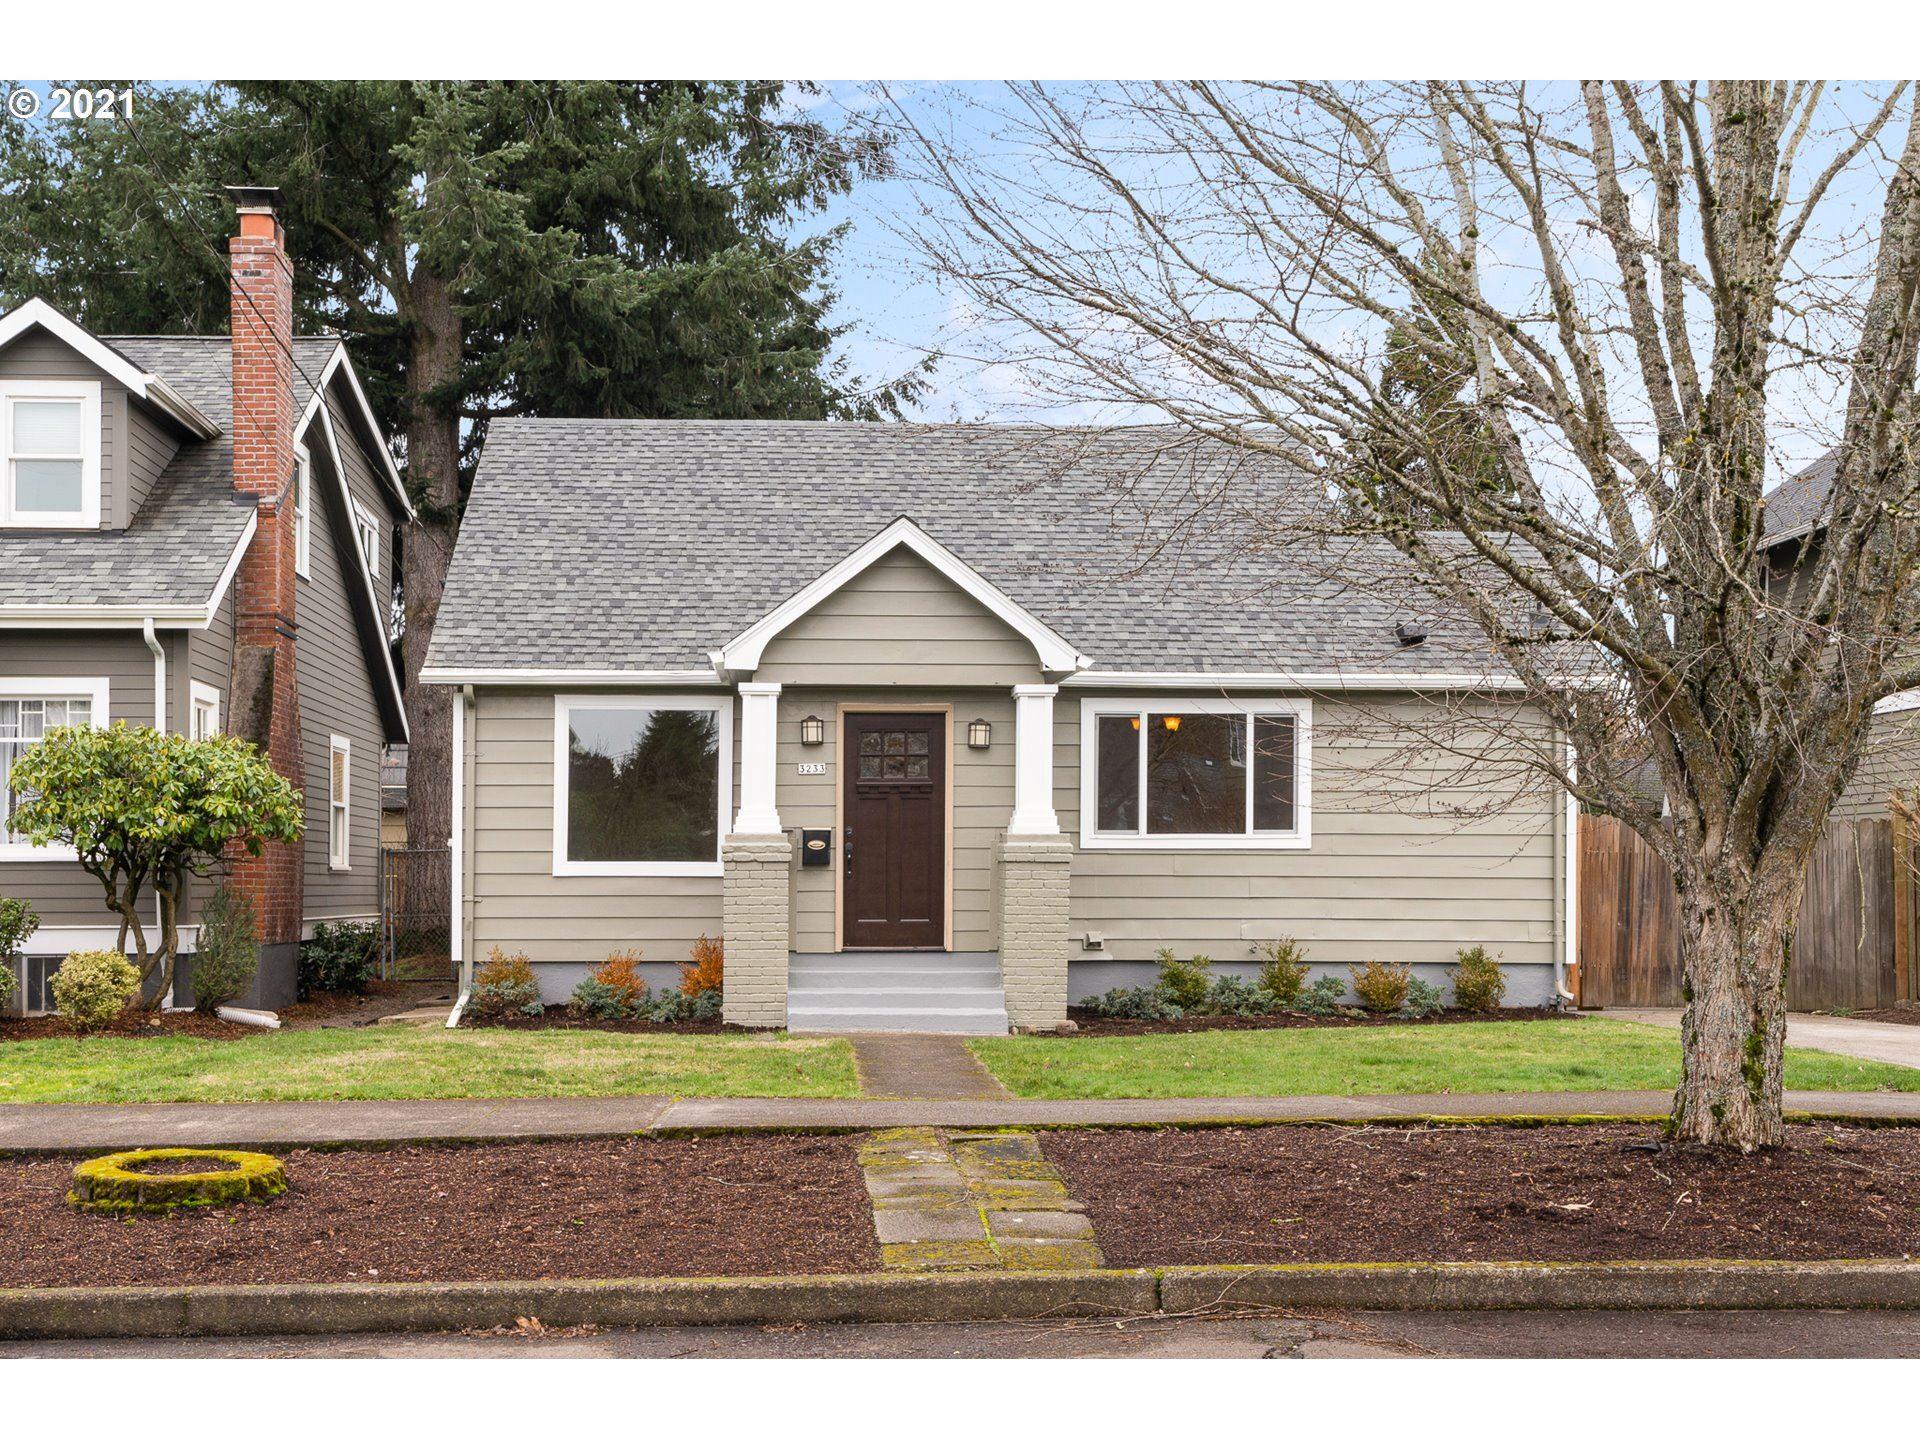 3233 NE 53rd AVE, Portland, OR 97213 - MLS#: 21690294